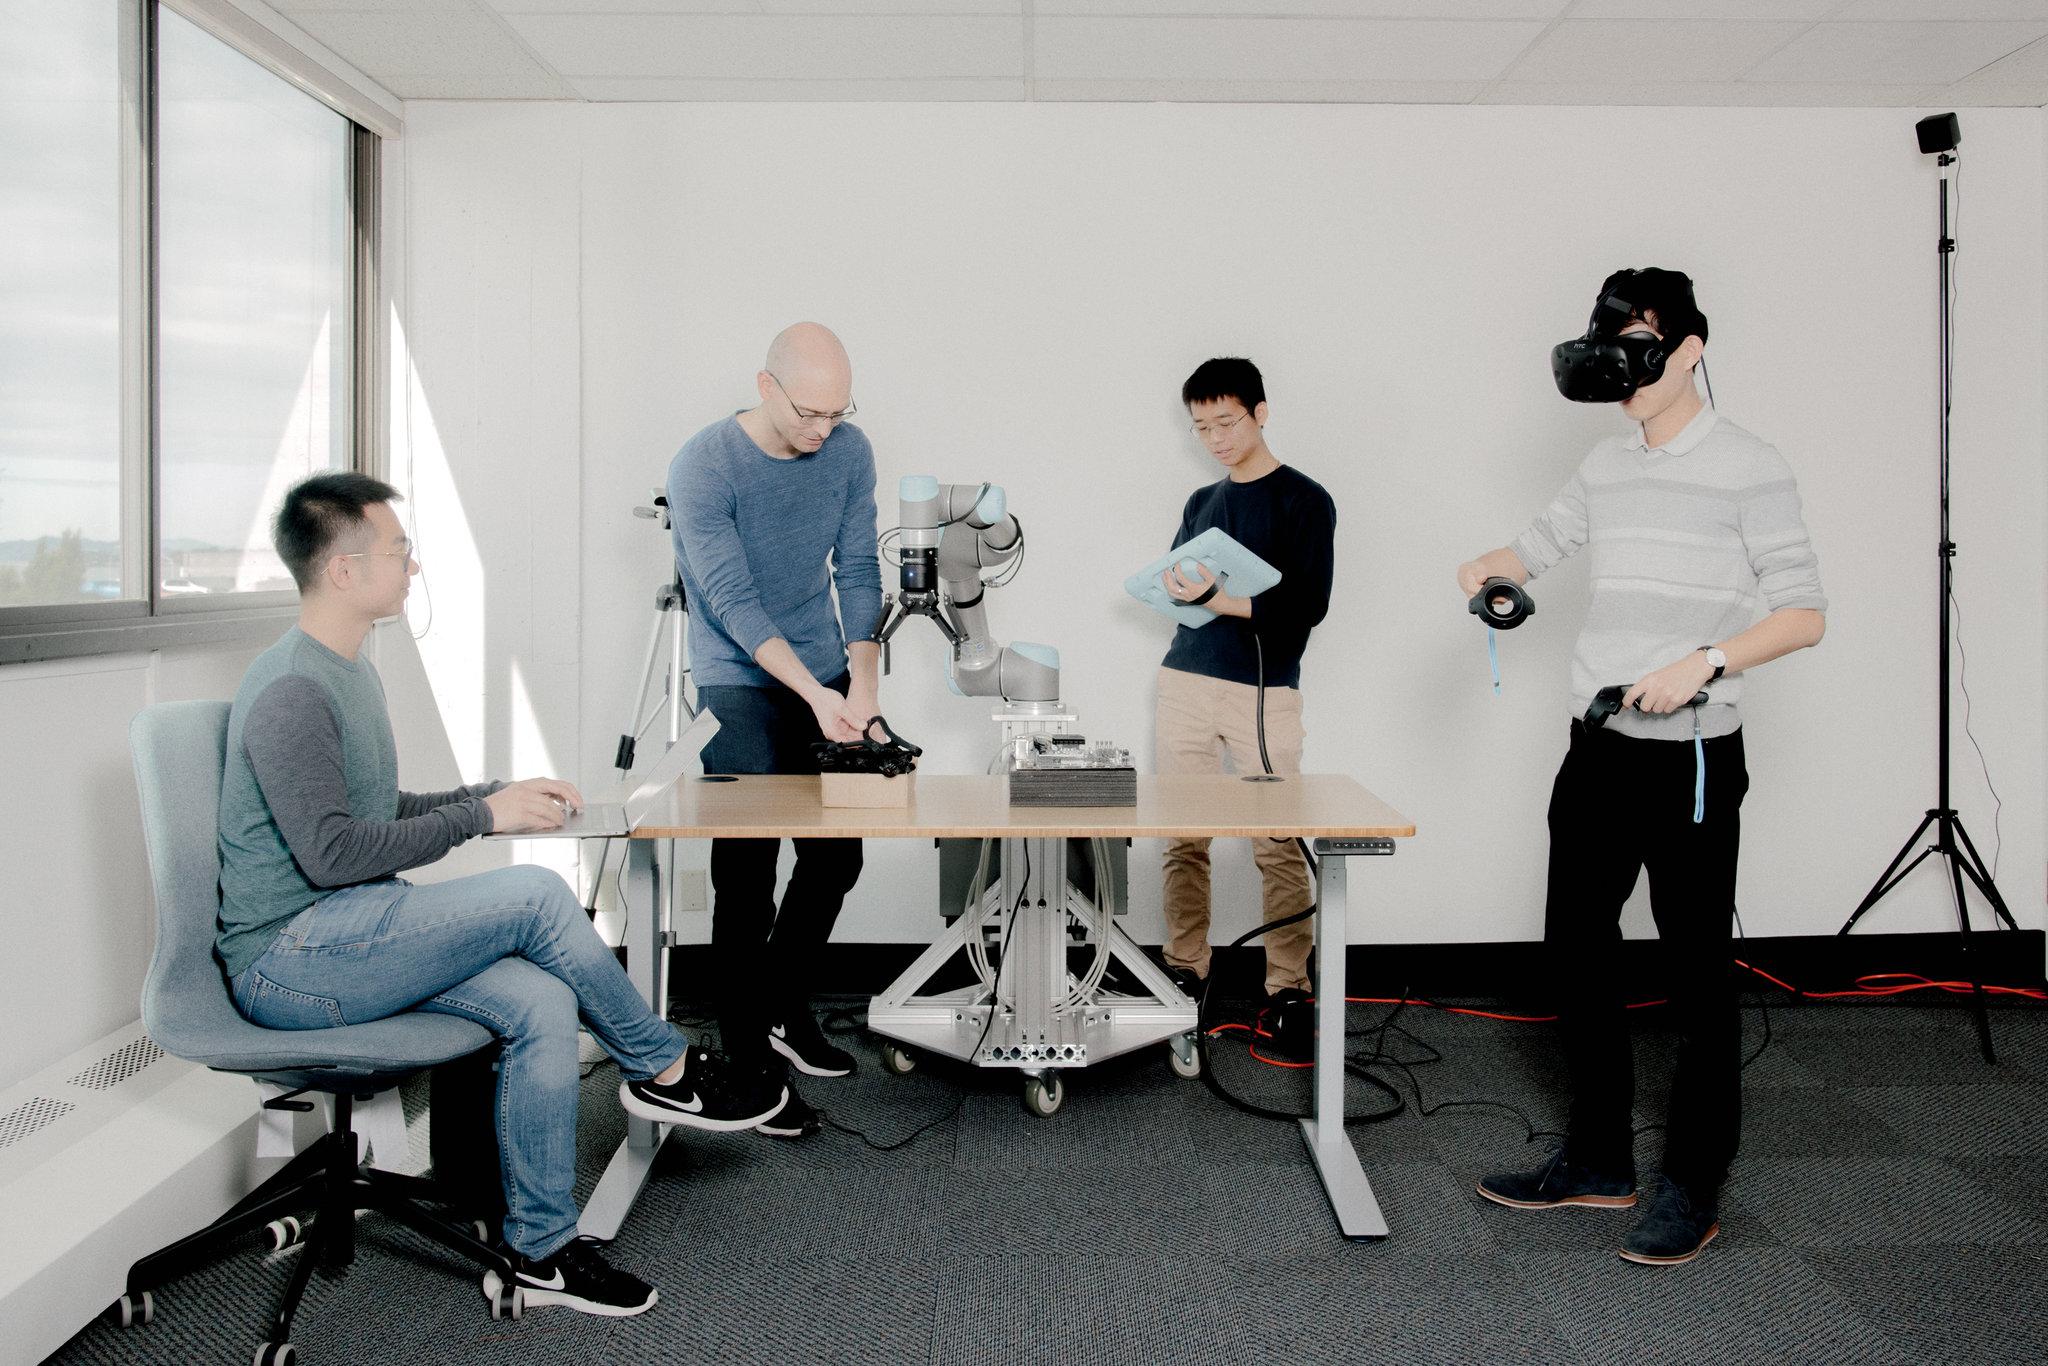 AI Researchers Leave Elon Musk Lab to Begin Robotics